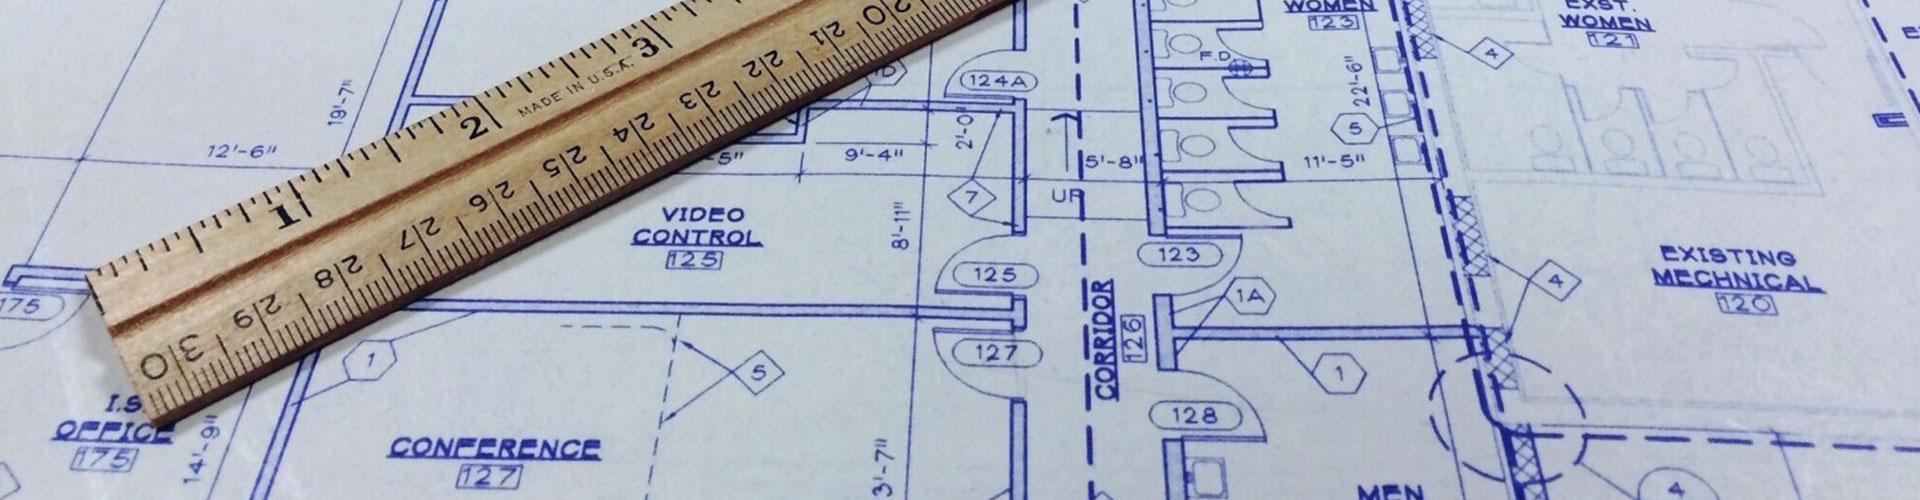 Blueprints apple press blueprint vancouver island bc malvernweather Image collections